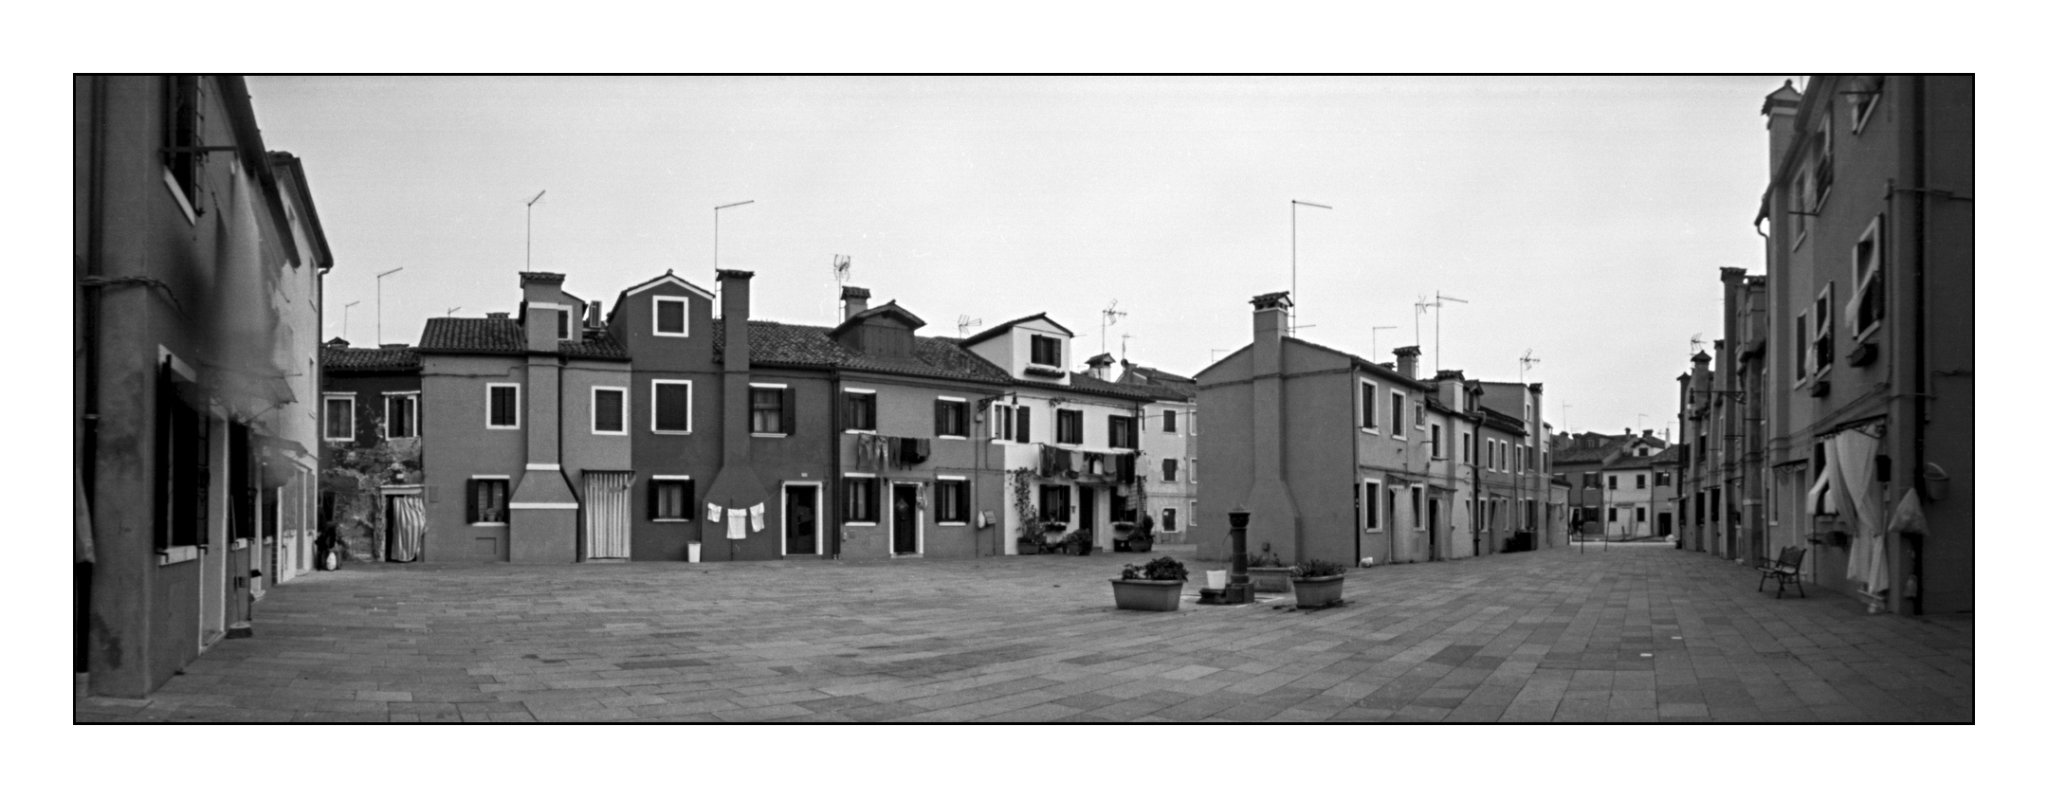 Lochkamera 16x7 analog: Burano, Fotograf: Steffen Lohse